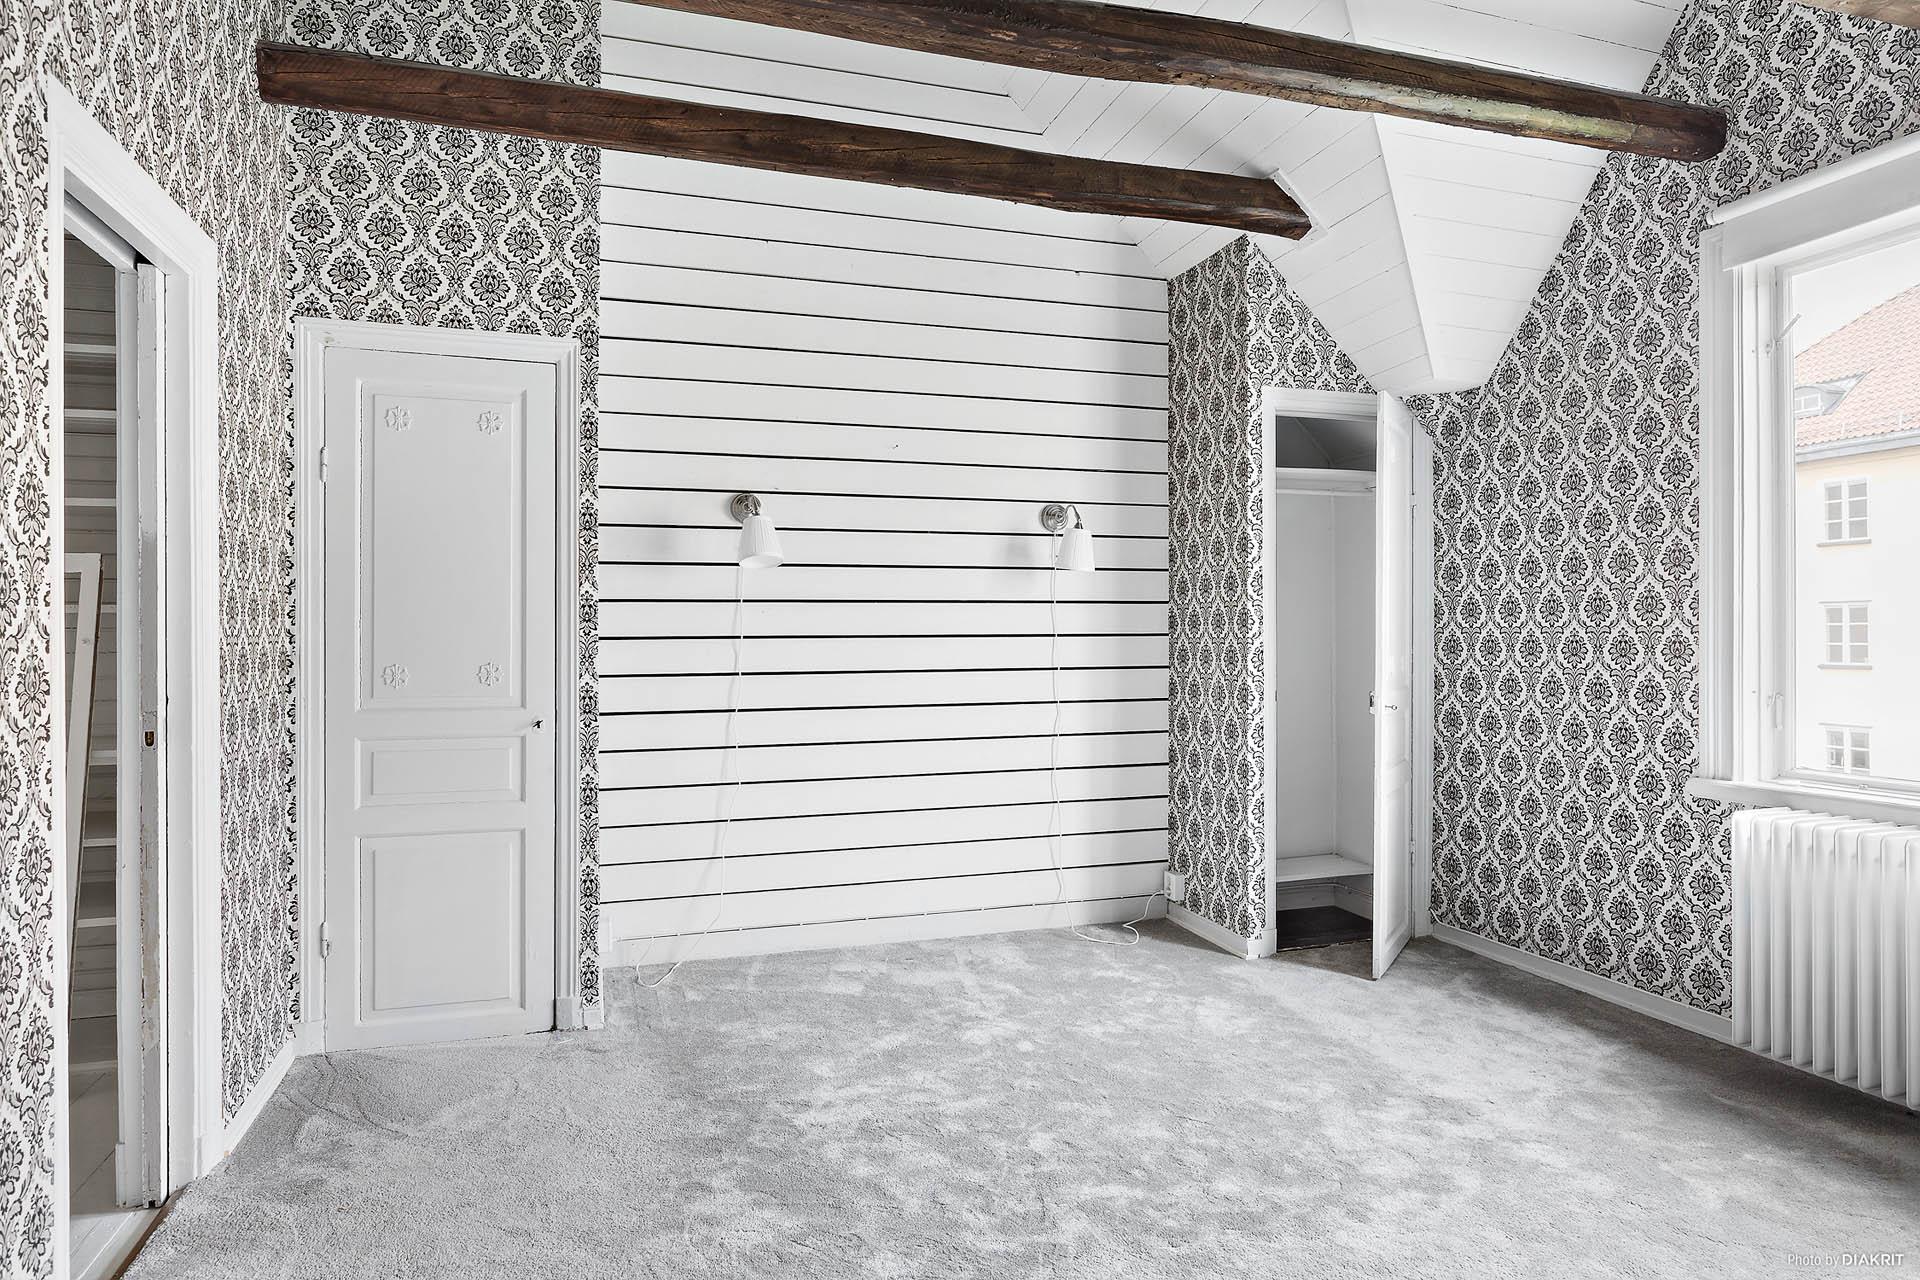 Master bedroom - sovrum 3